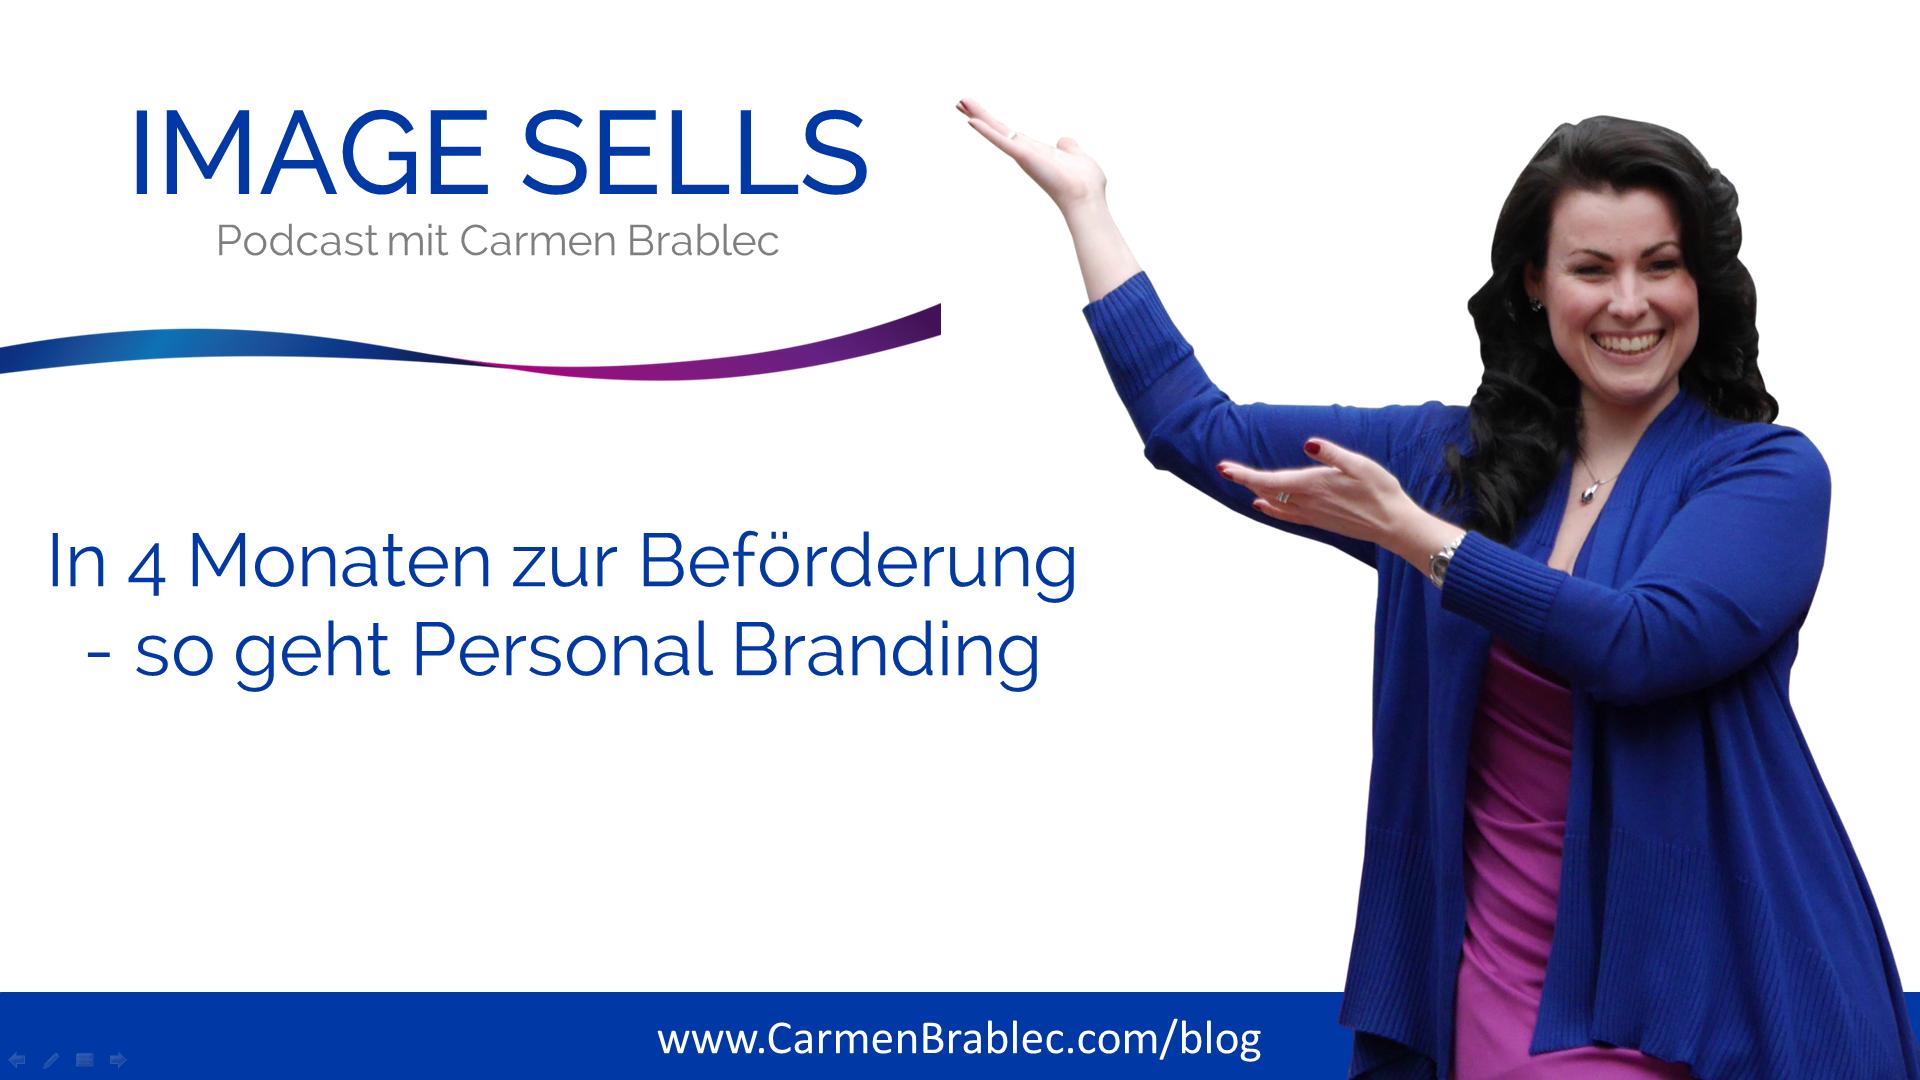 In 4 Monaten zur Beförderung – so geht Personal Branding – ISP #009